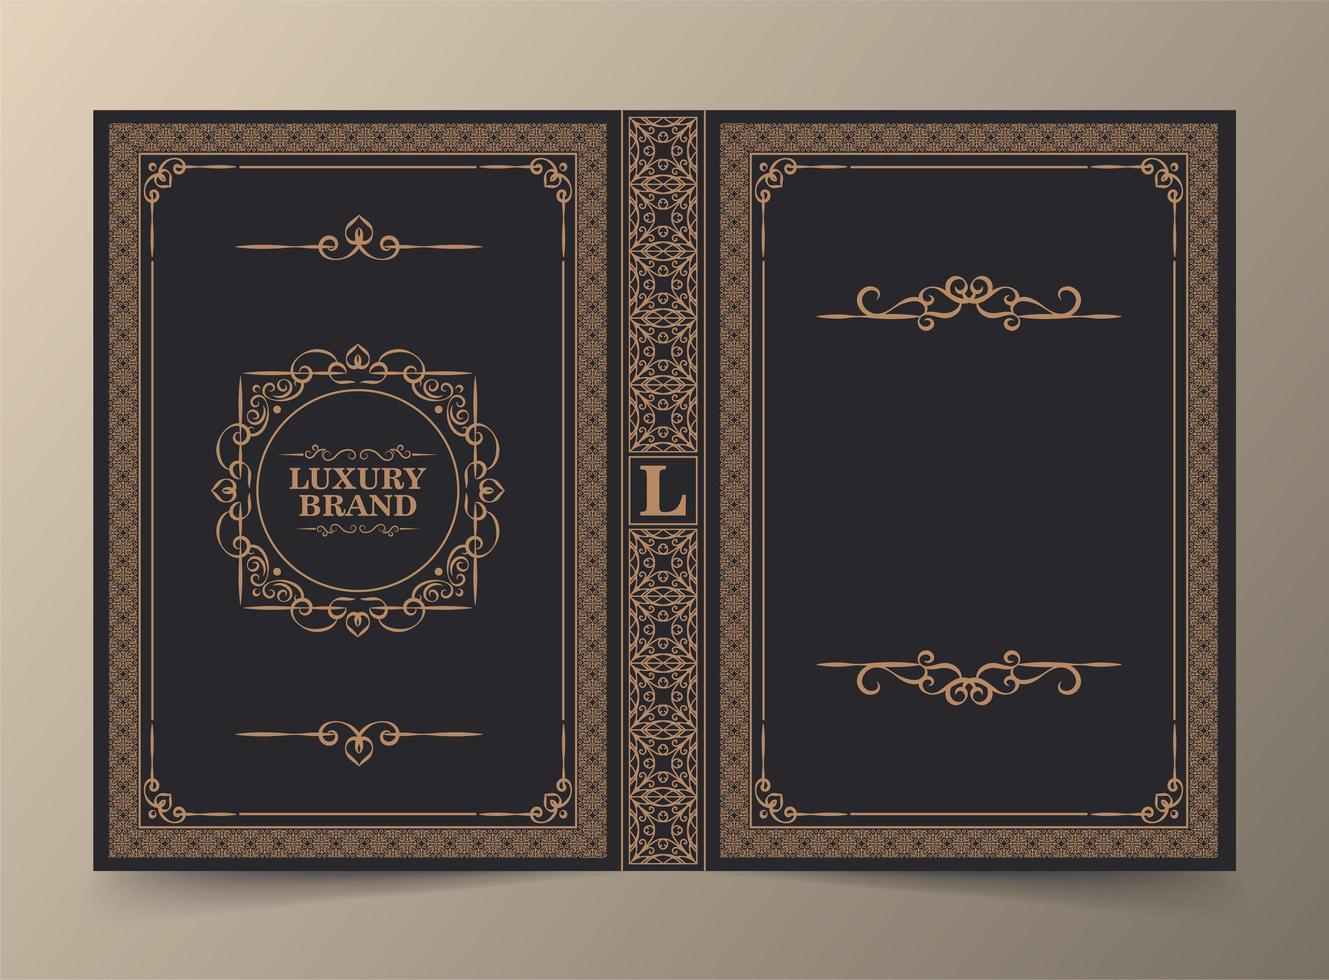 diseño de portada de libro ornamental vector